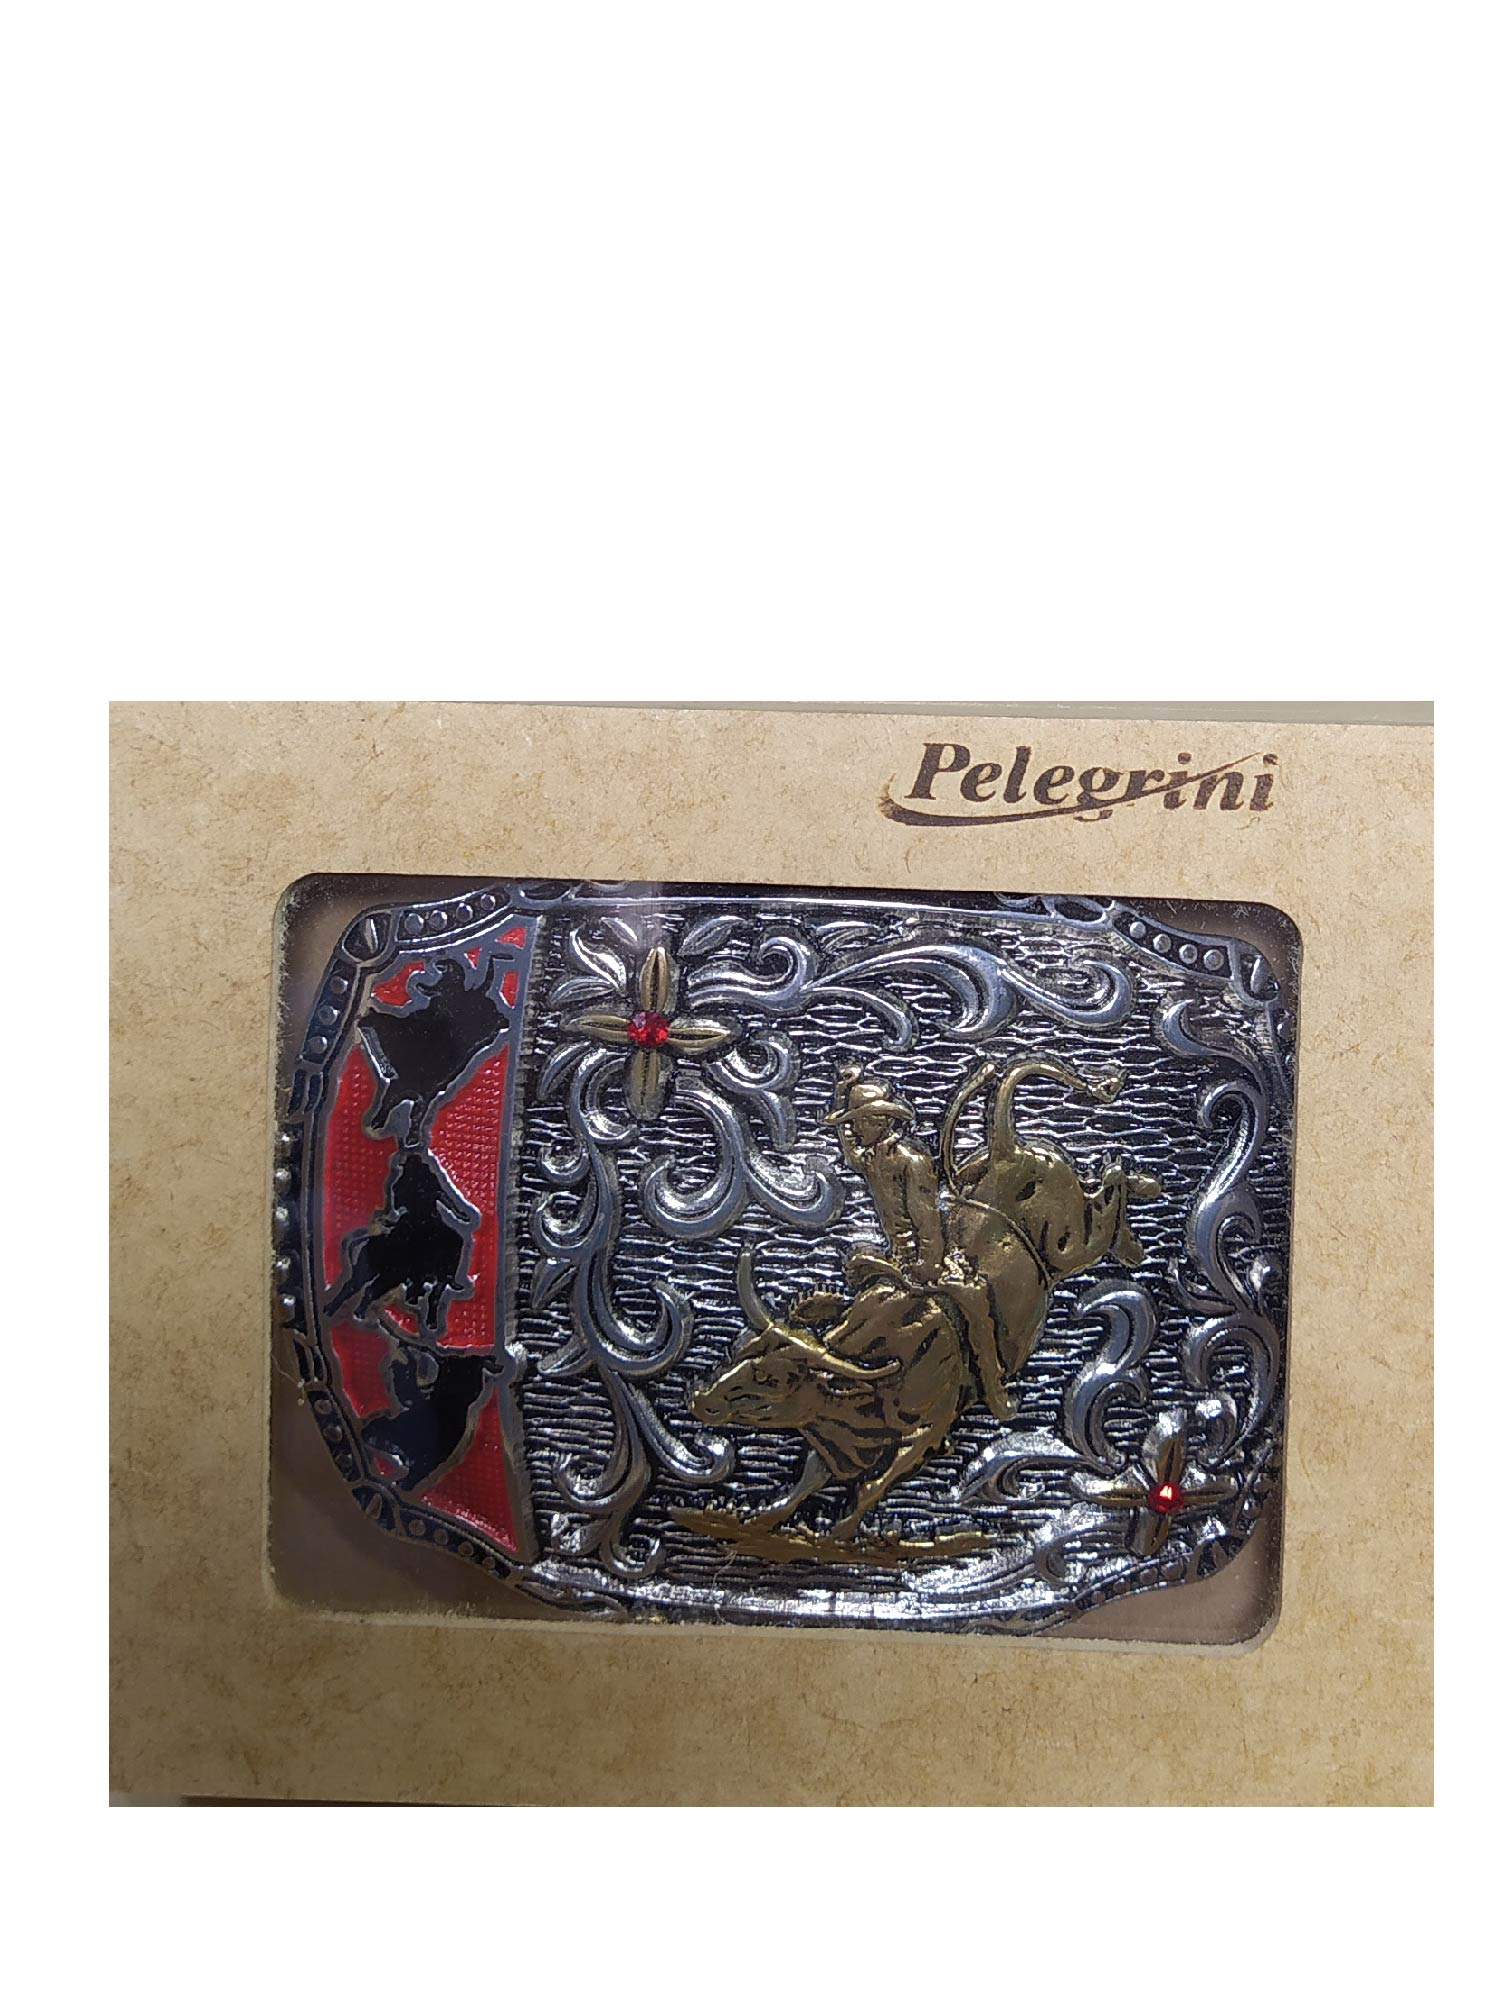 Fivela Pelegrini Bull Rider Ref. 5044